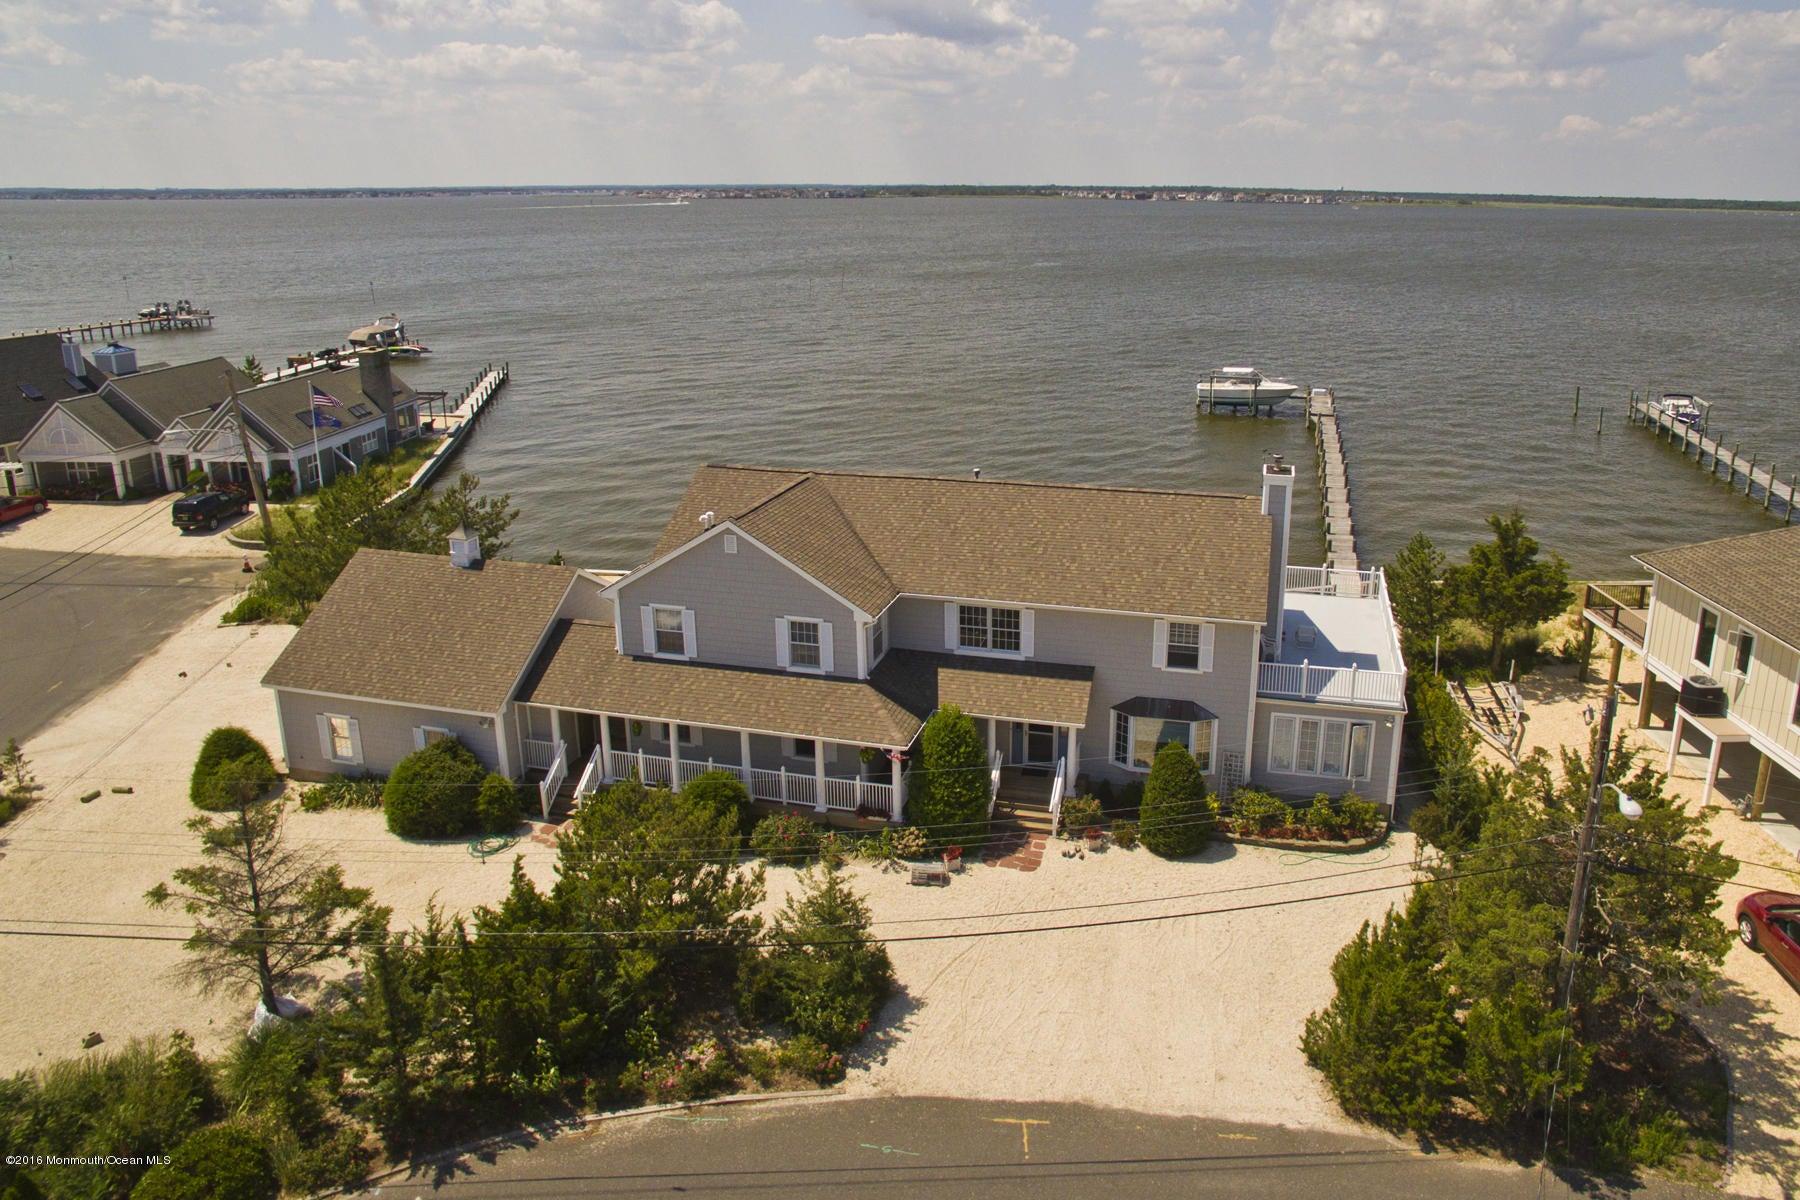 497 Normandy Drive, Normandy Beach, NJ 08739